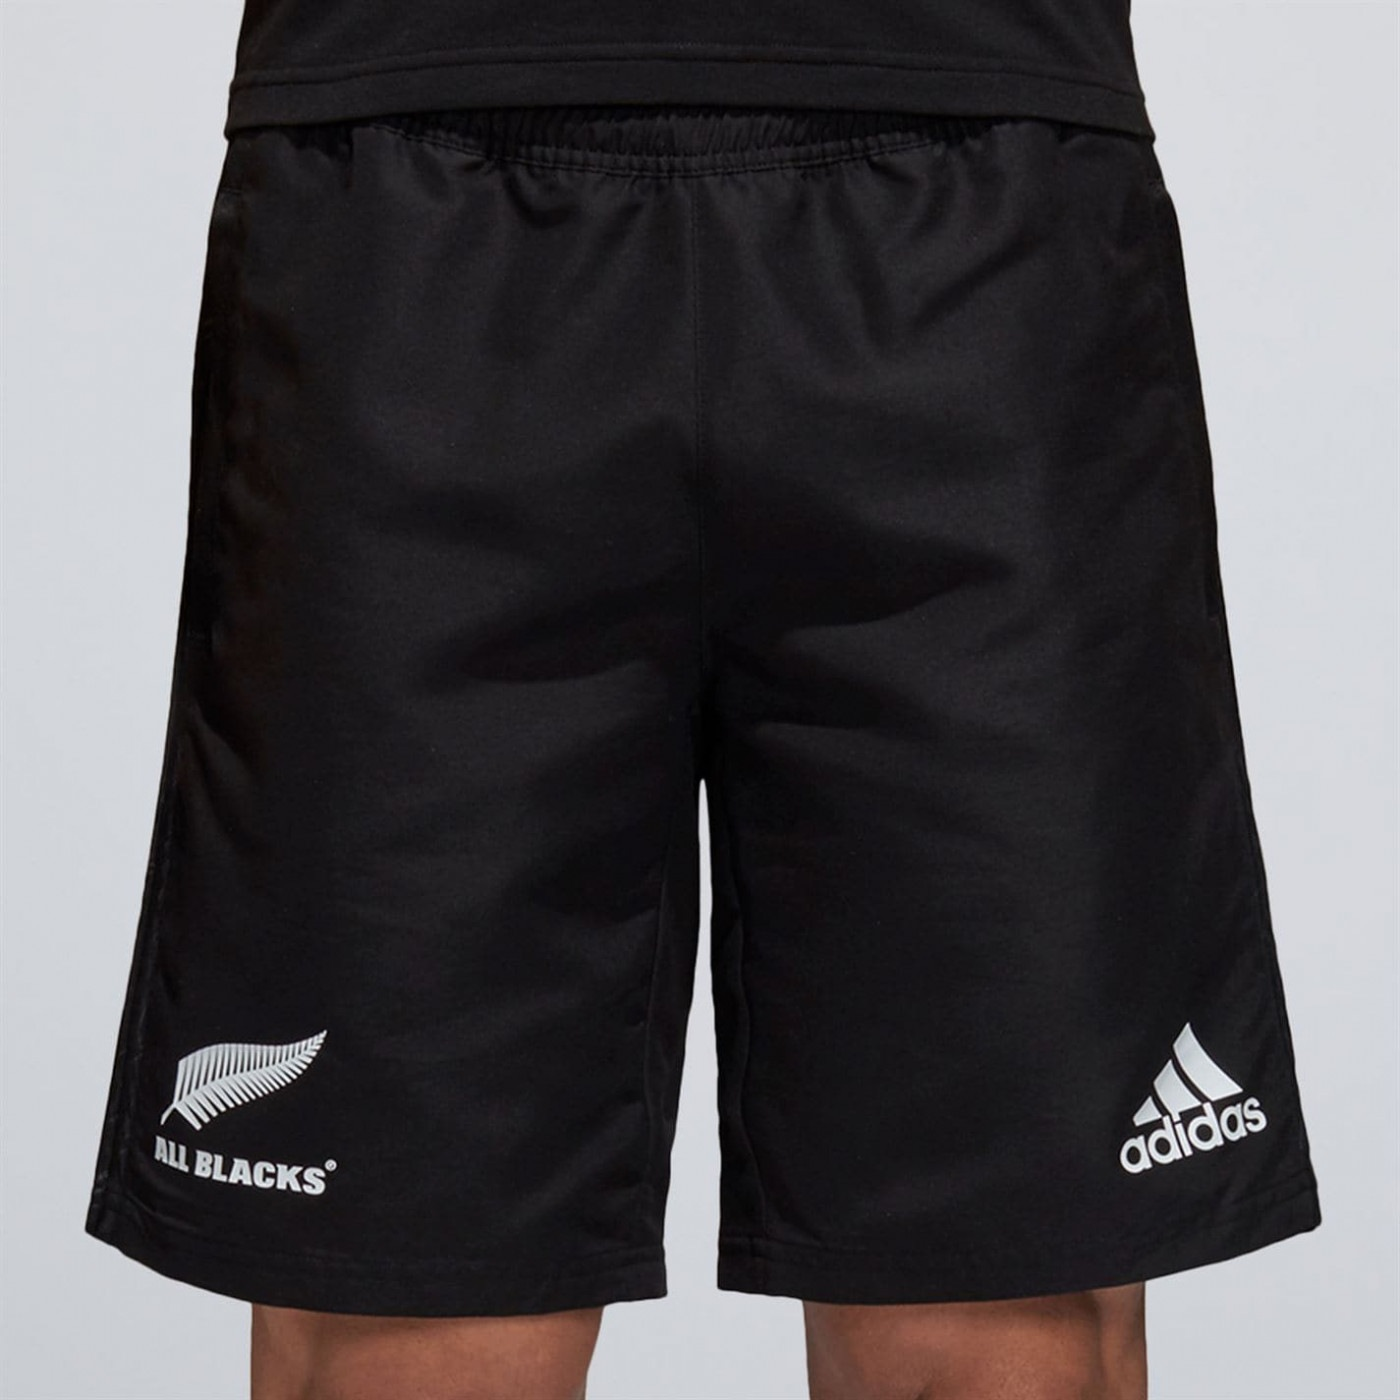 Adidas New Zealand Shorts Mens